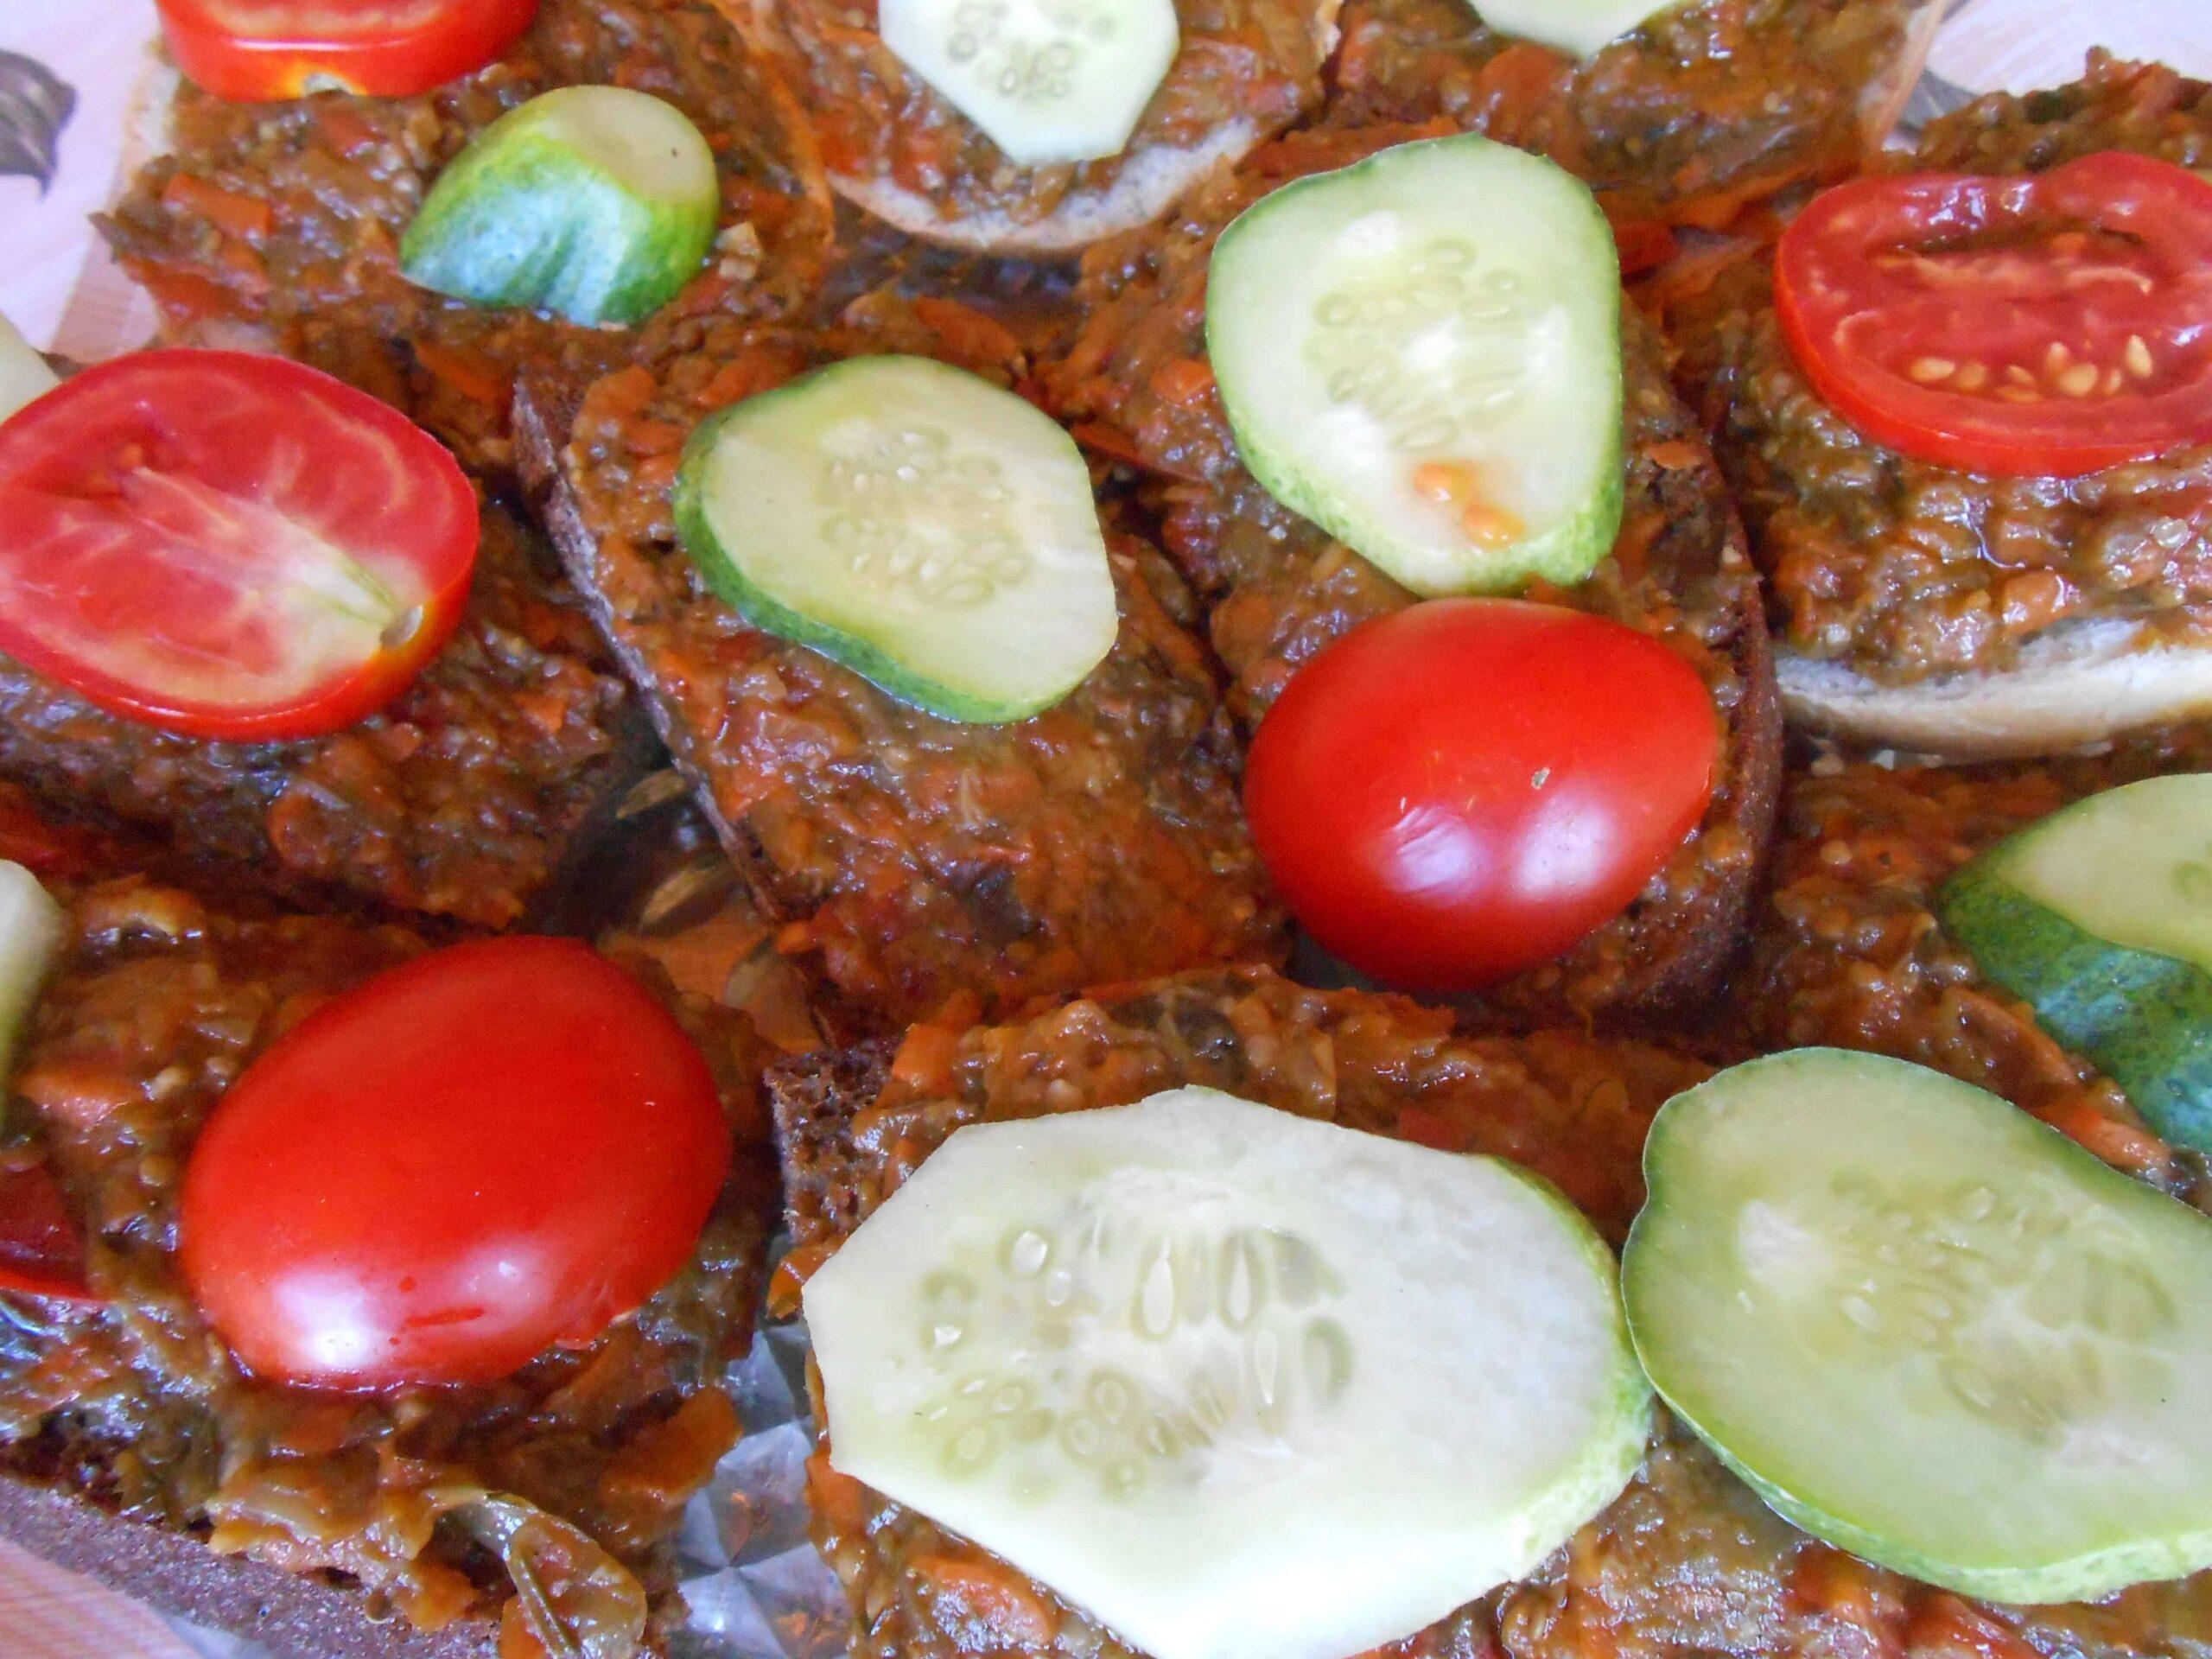 На фото: овощи и мясо на гриле / Авторское фото